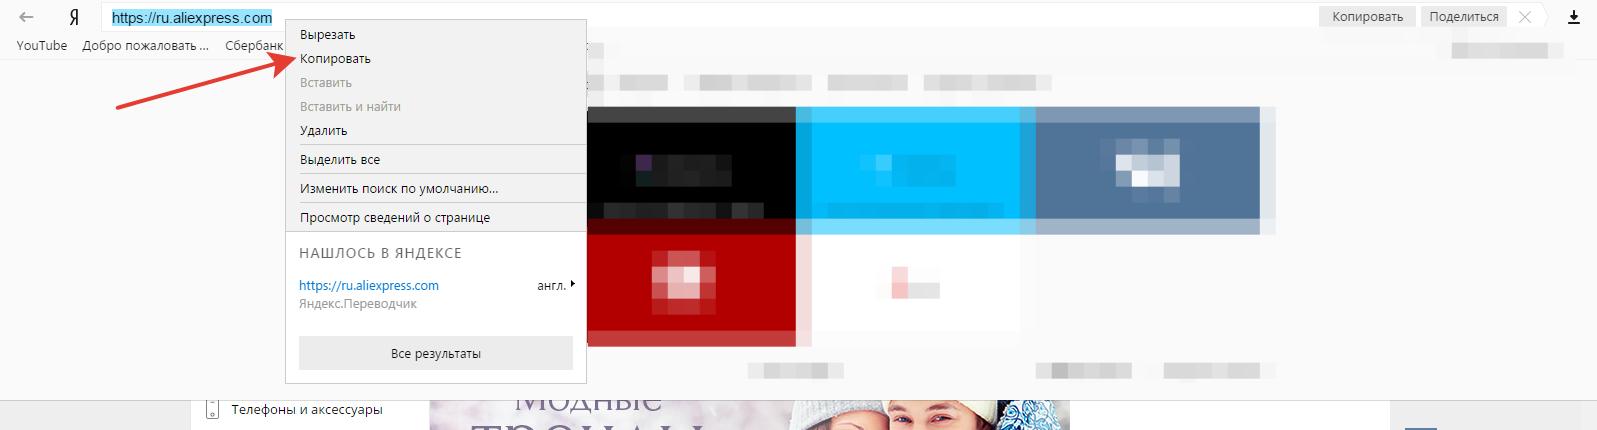 как найти url адрес картинки